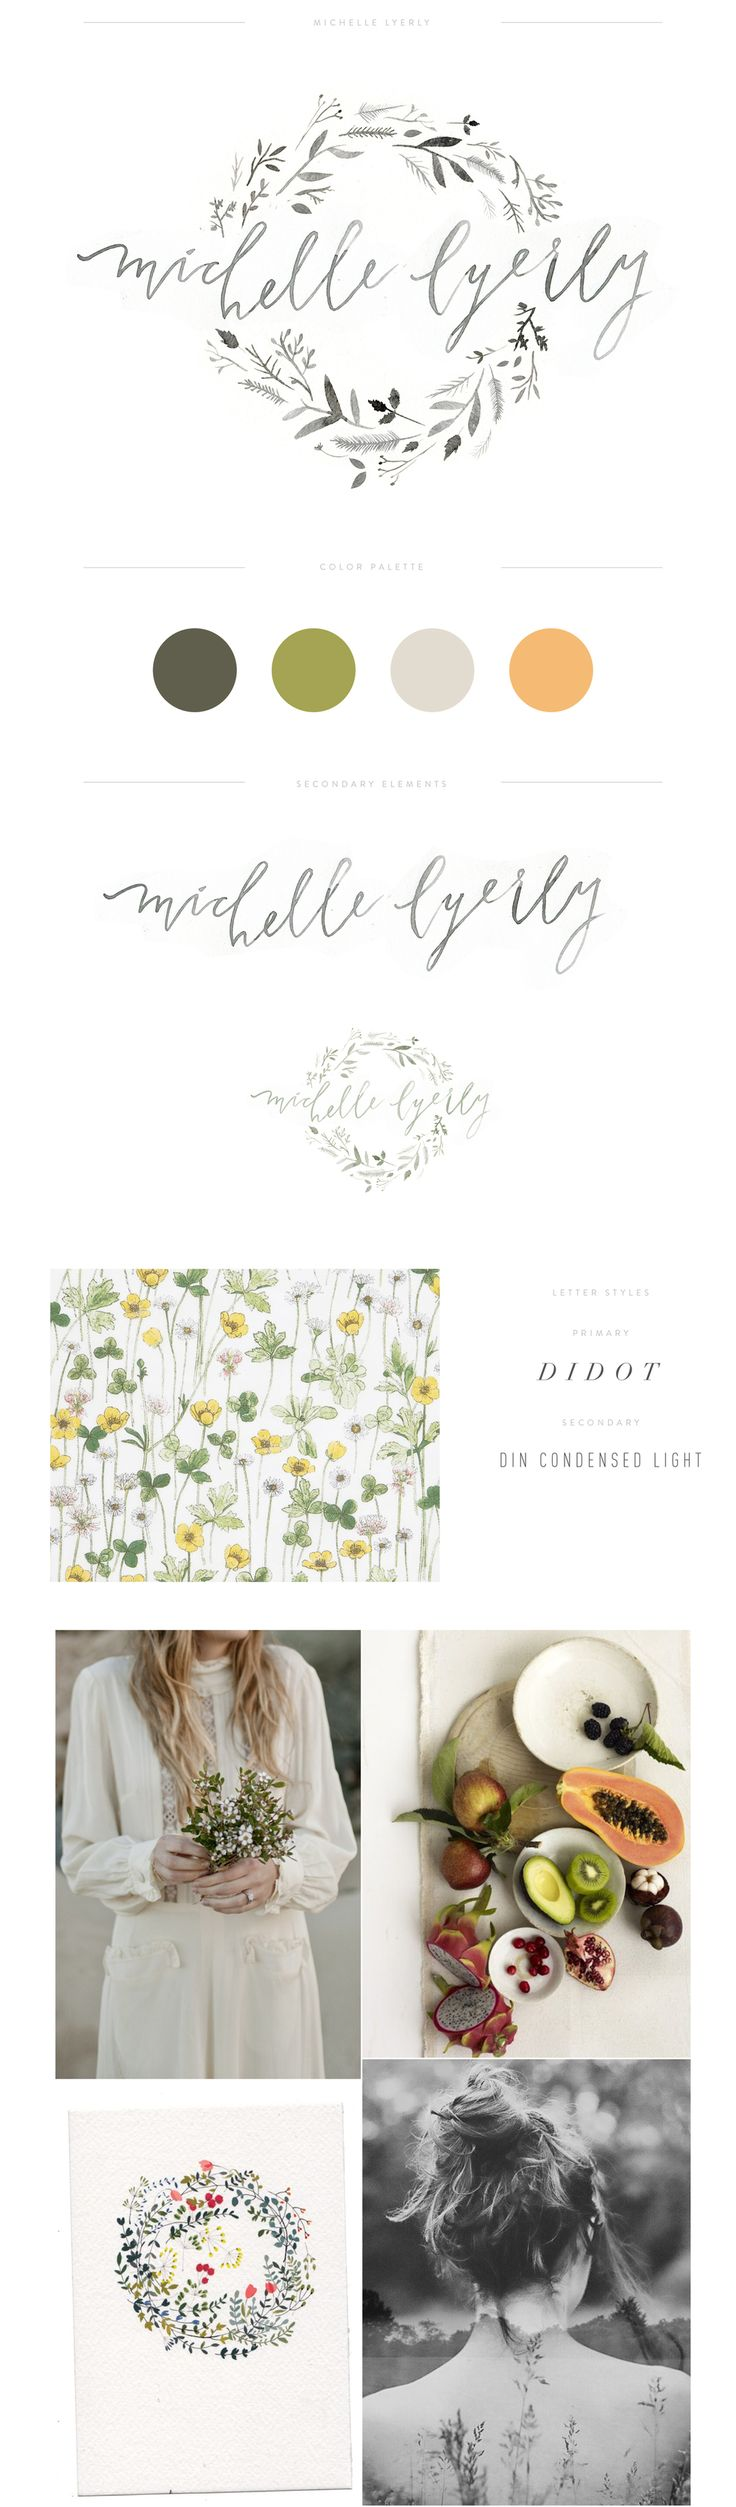 Michelle Lyerly Photography brand board || Lauren Ledbetter Design + Styling